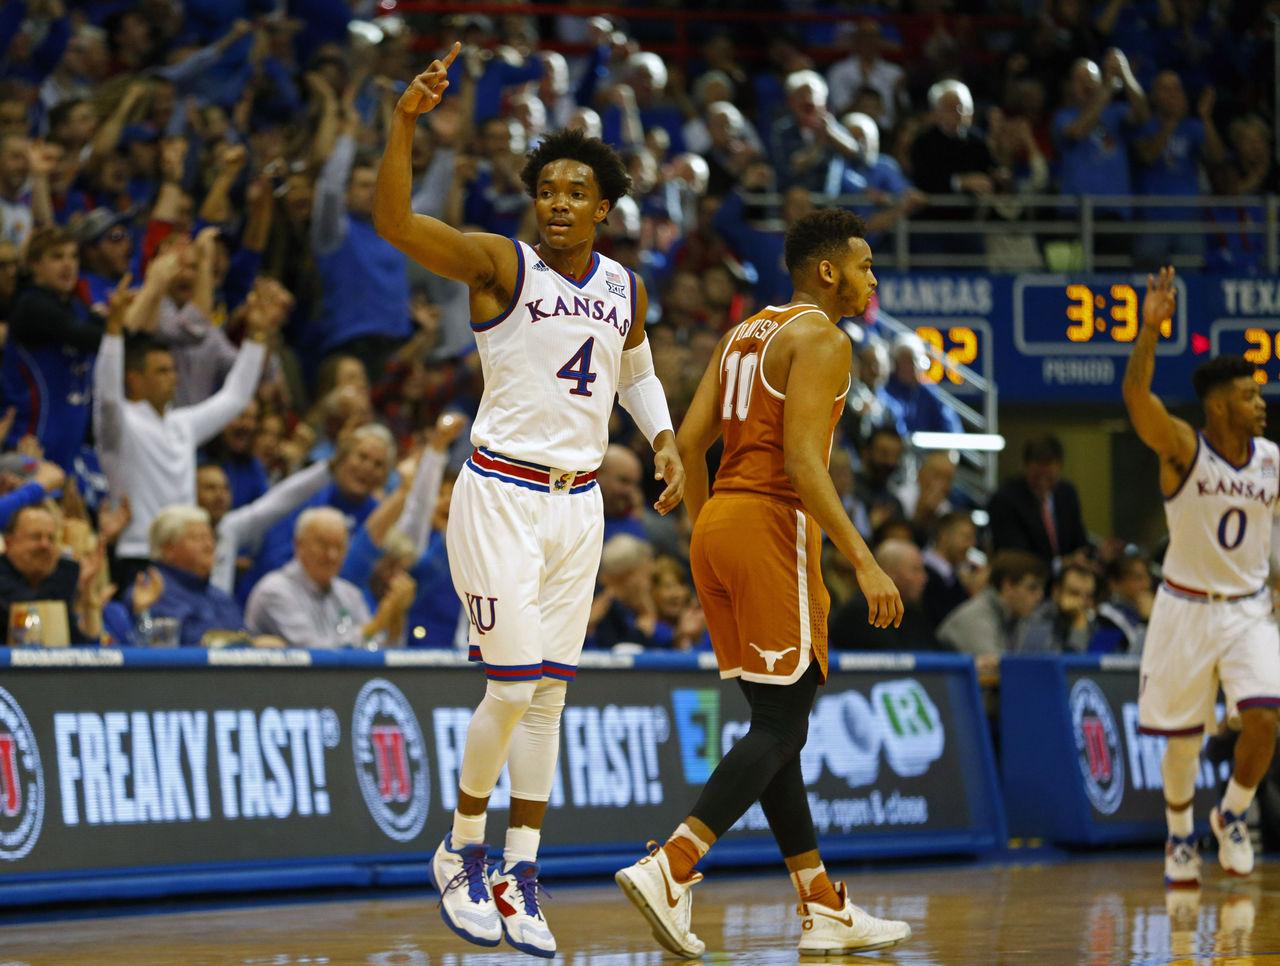 Cropped_2017-01-21t201609z_538642481_nocid_rtrmadp_3_ncaa-basketball-texas-at-kansas